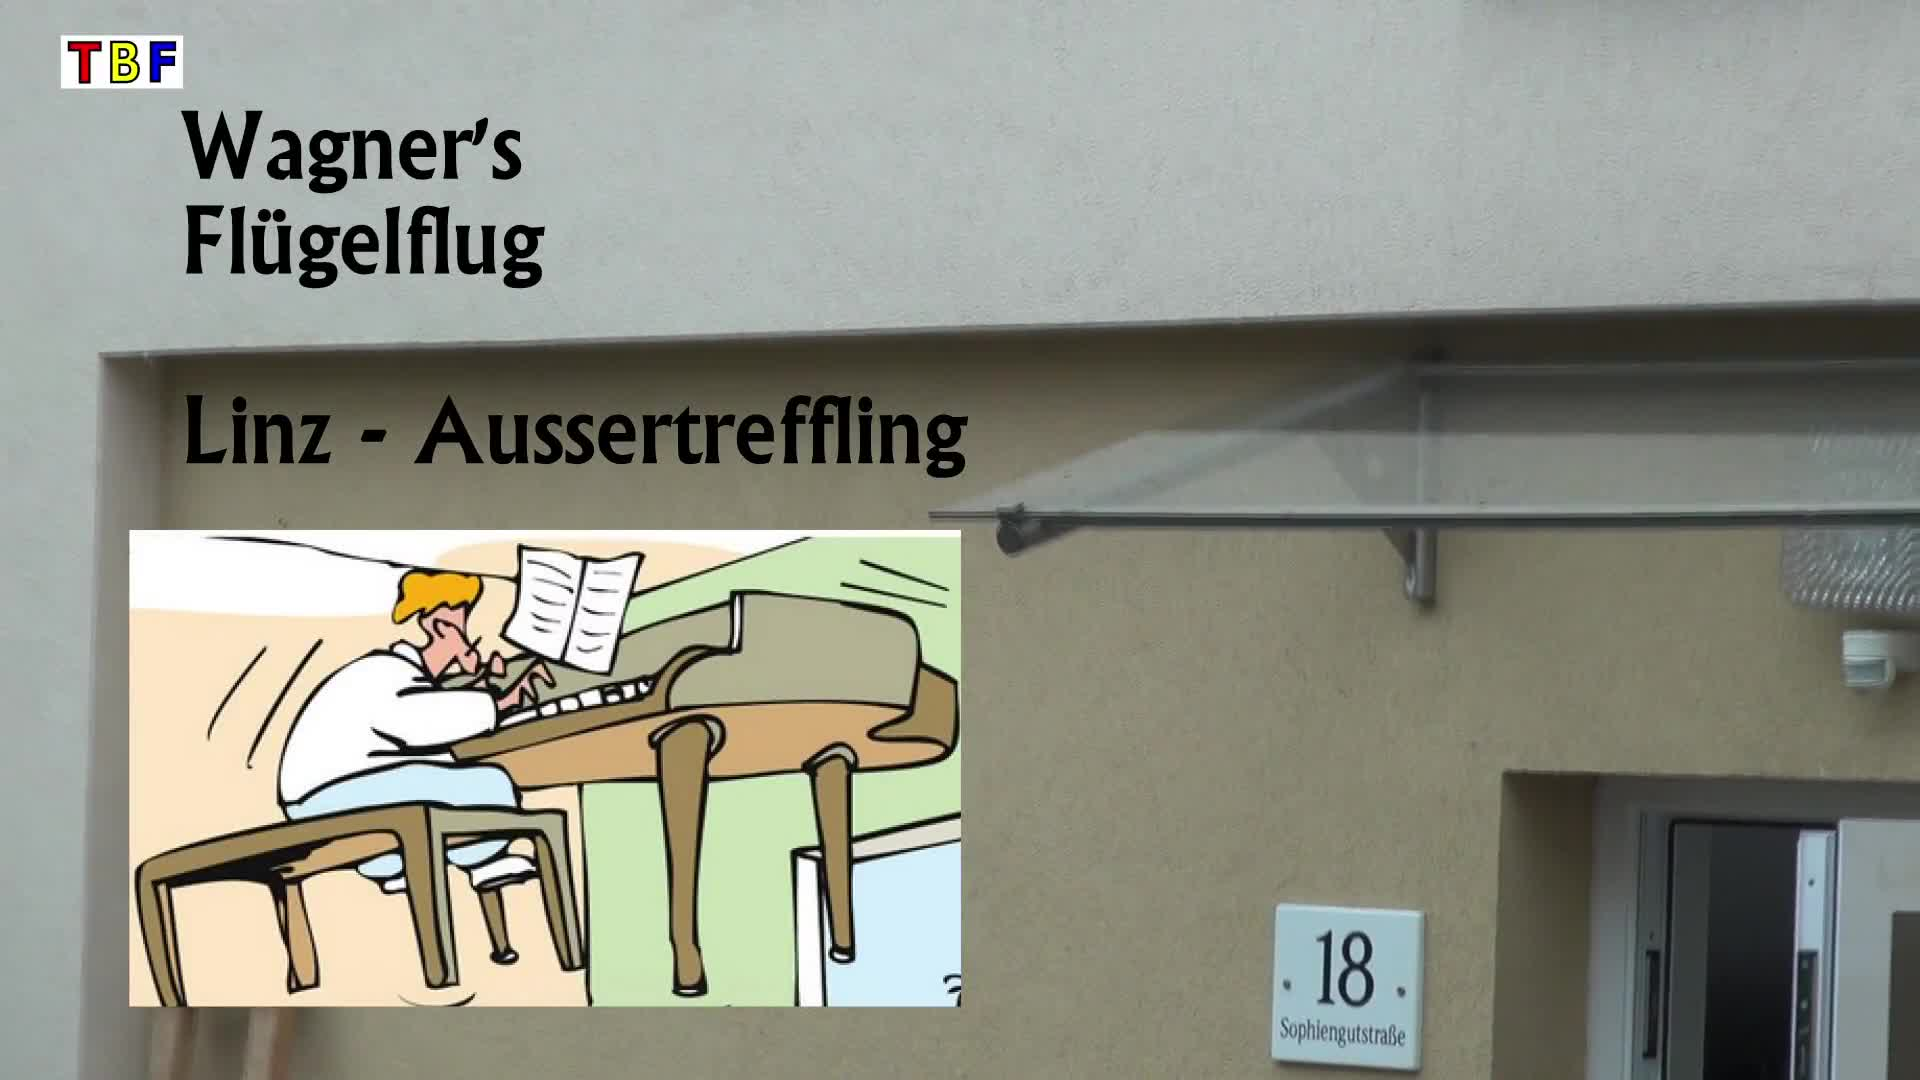 Wagner's Flügelflug